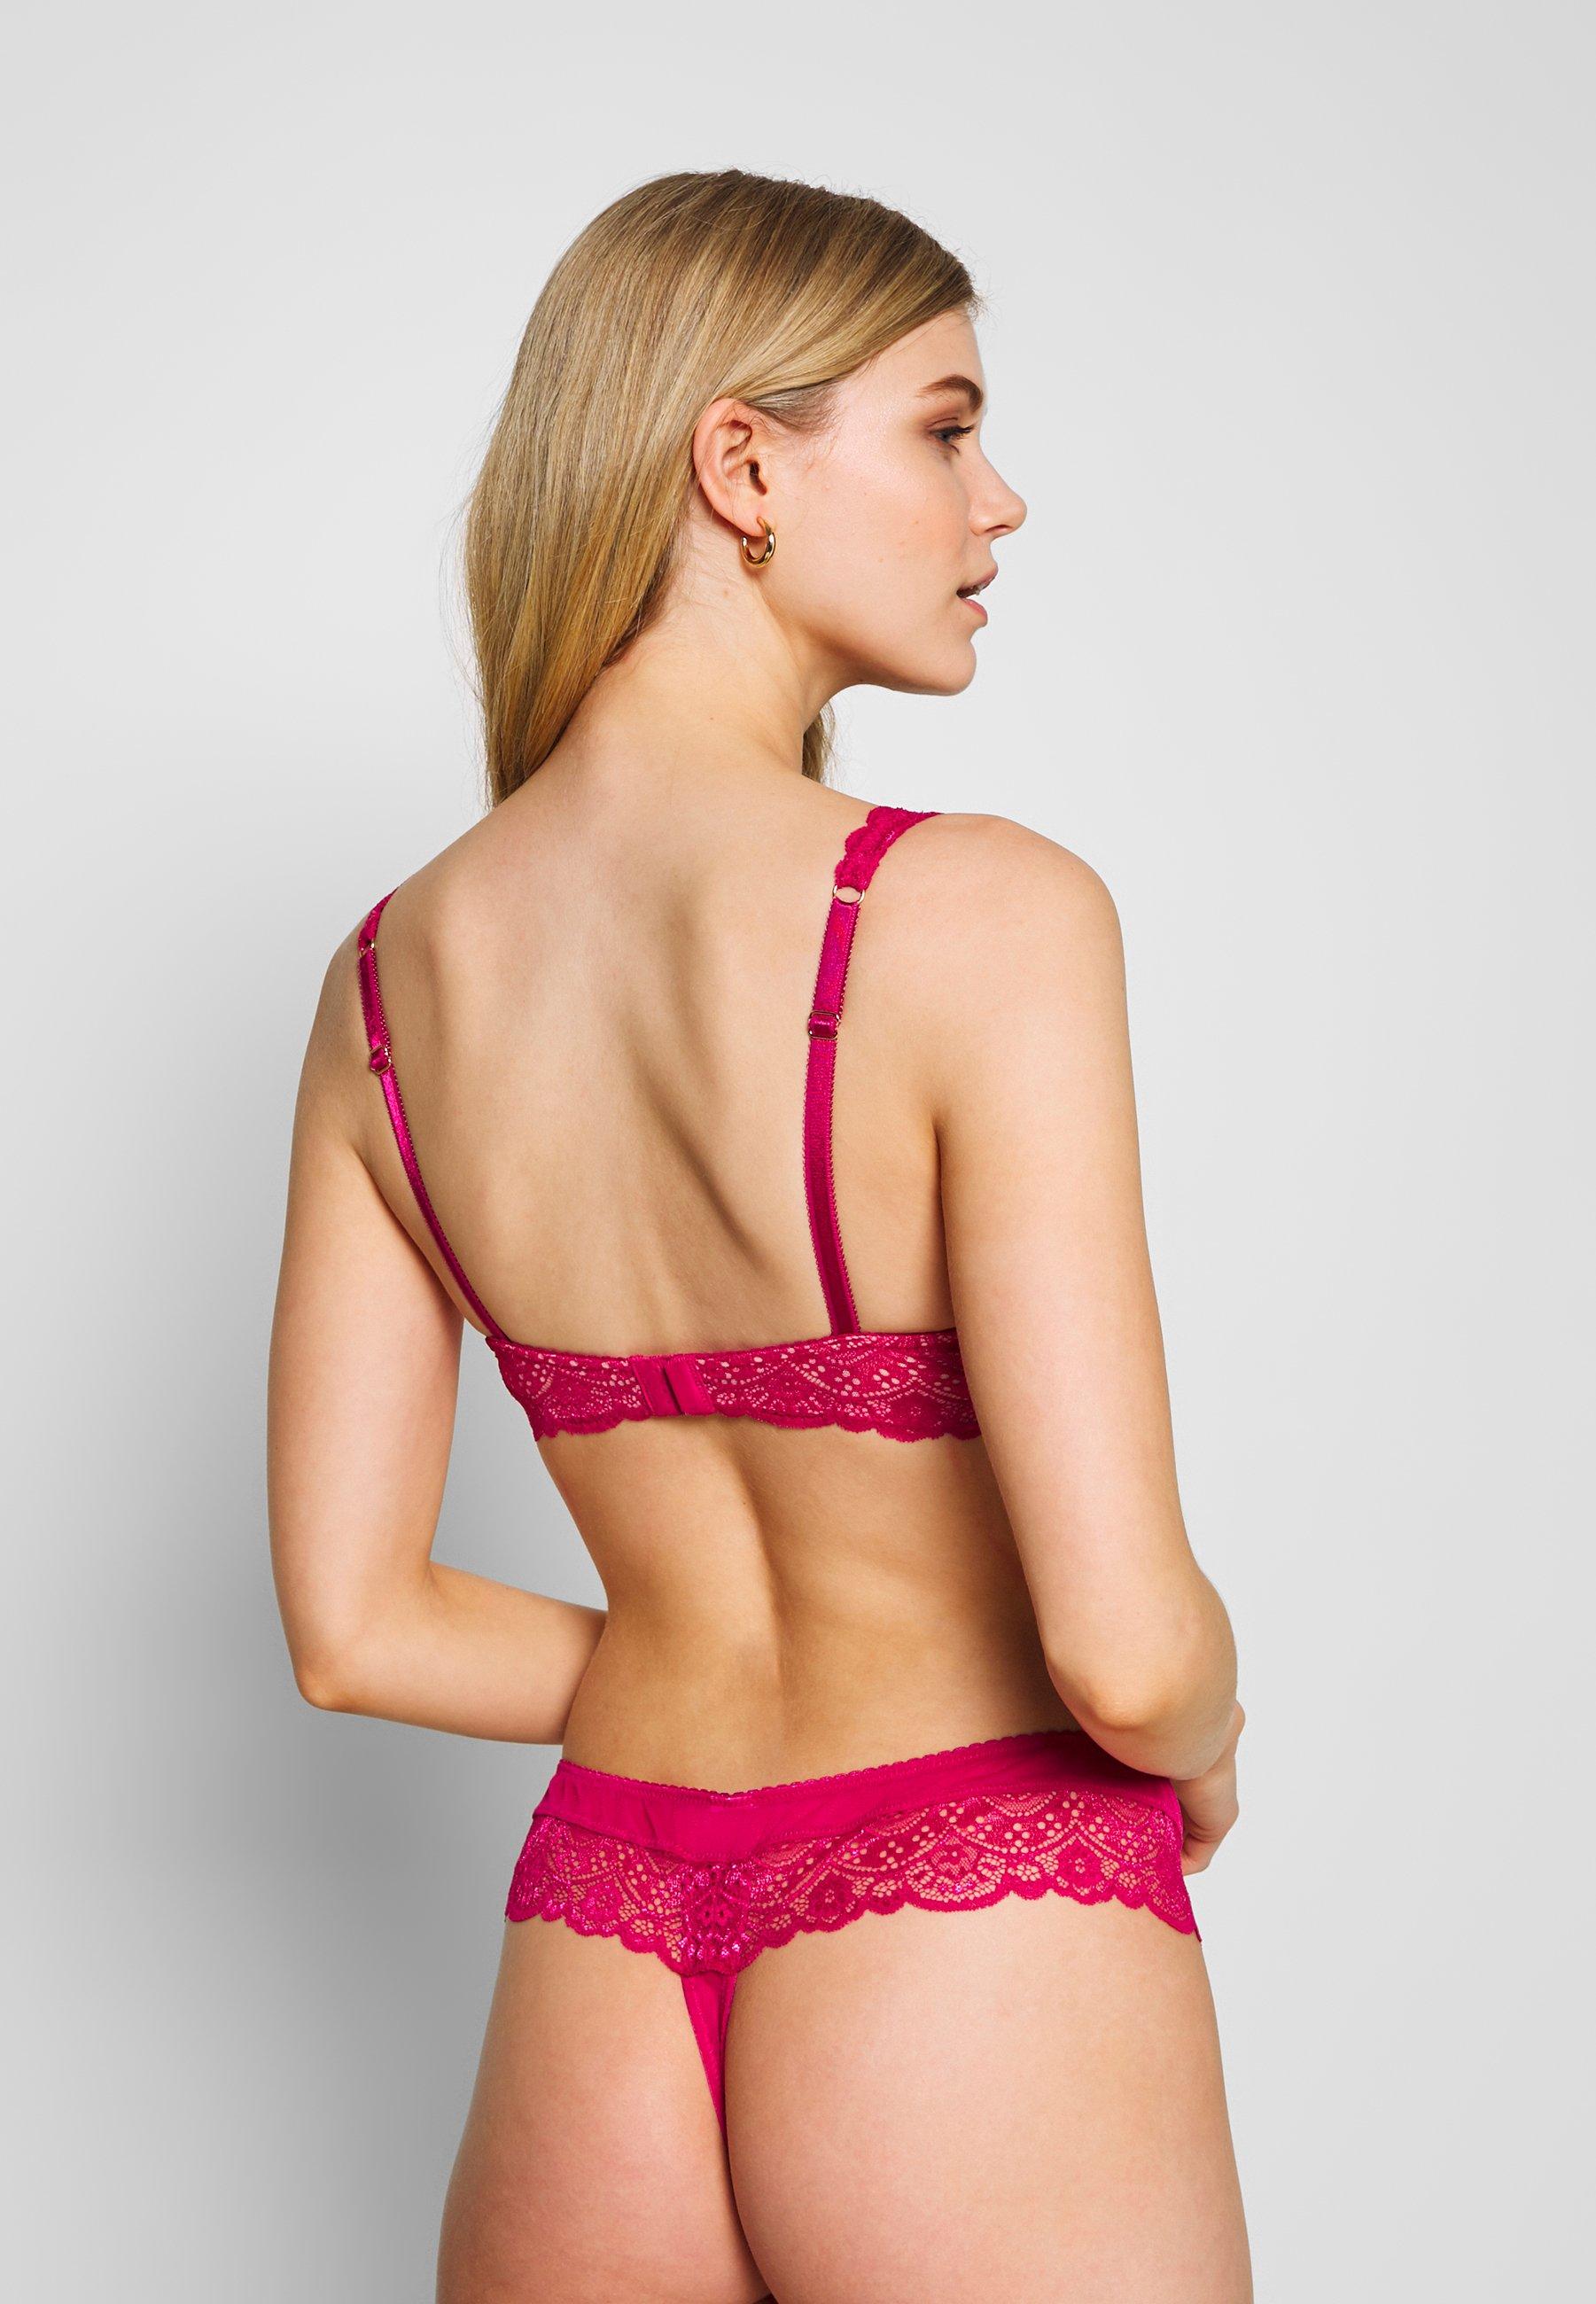 Boux Avenue TORI PADDED PLUNGE - Sujetador con aros - pink/blush 6A0h7